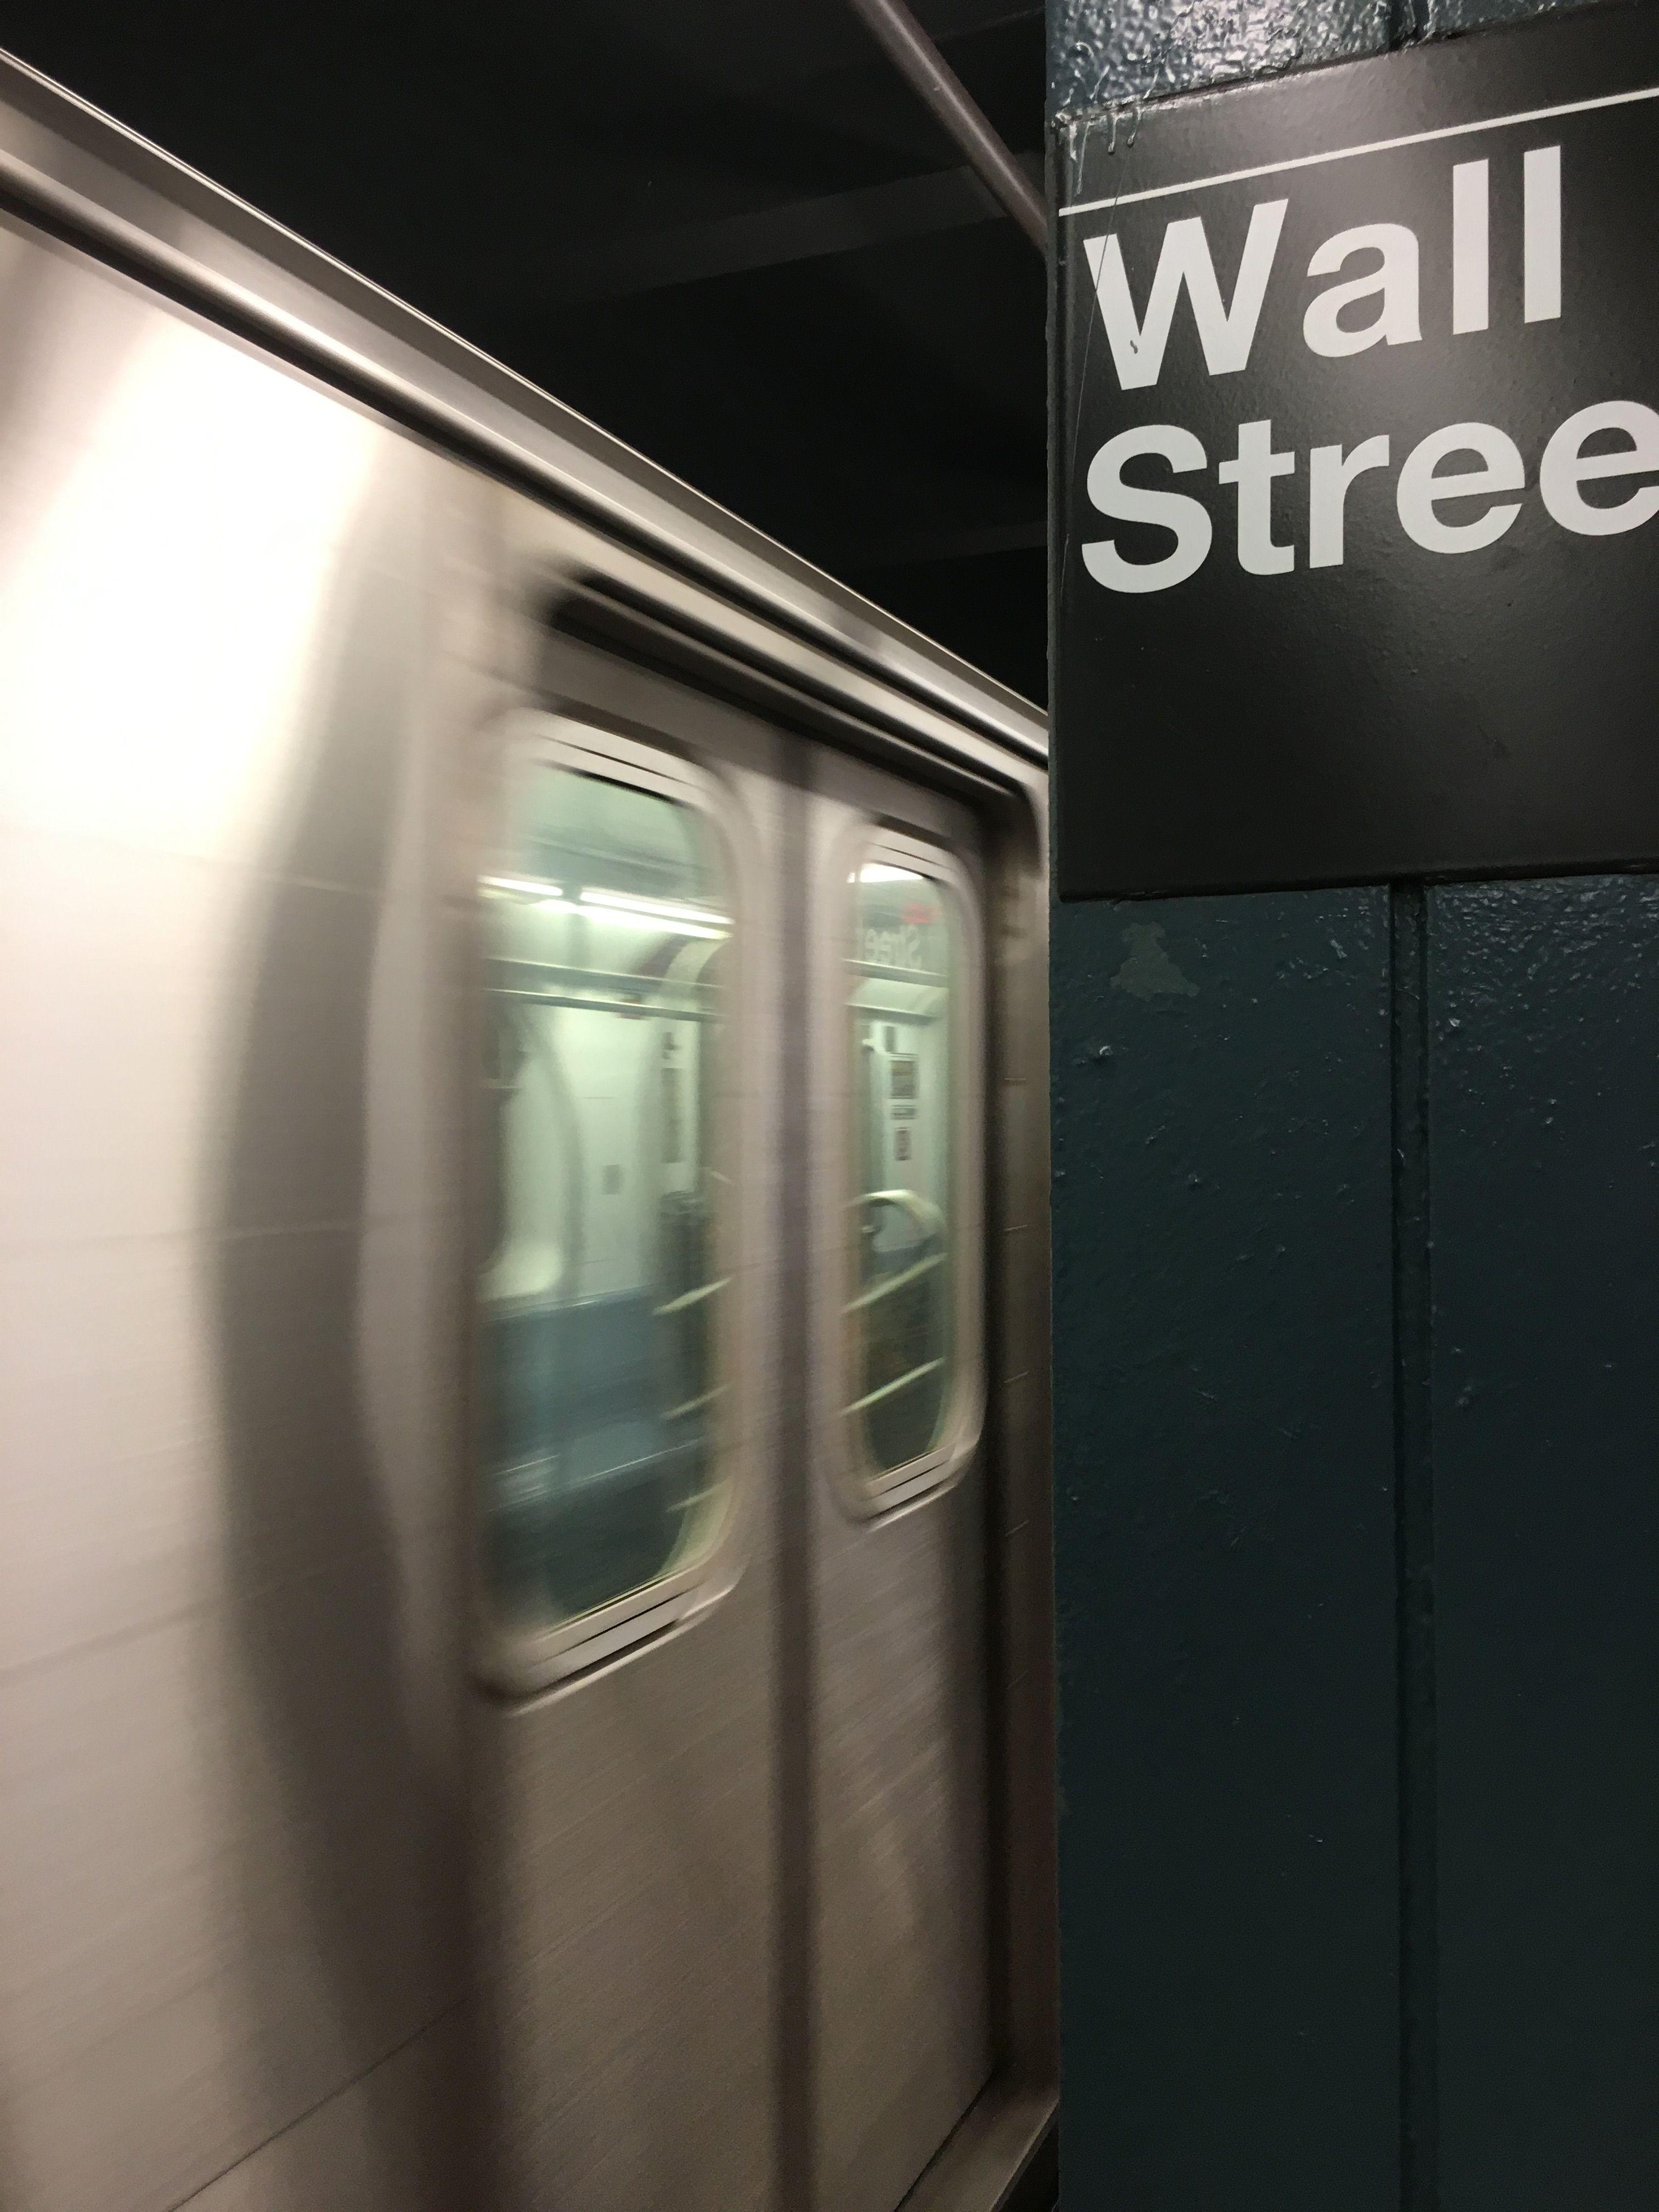 Down under Wall Street